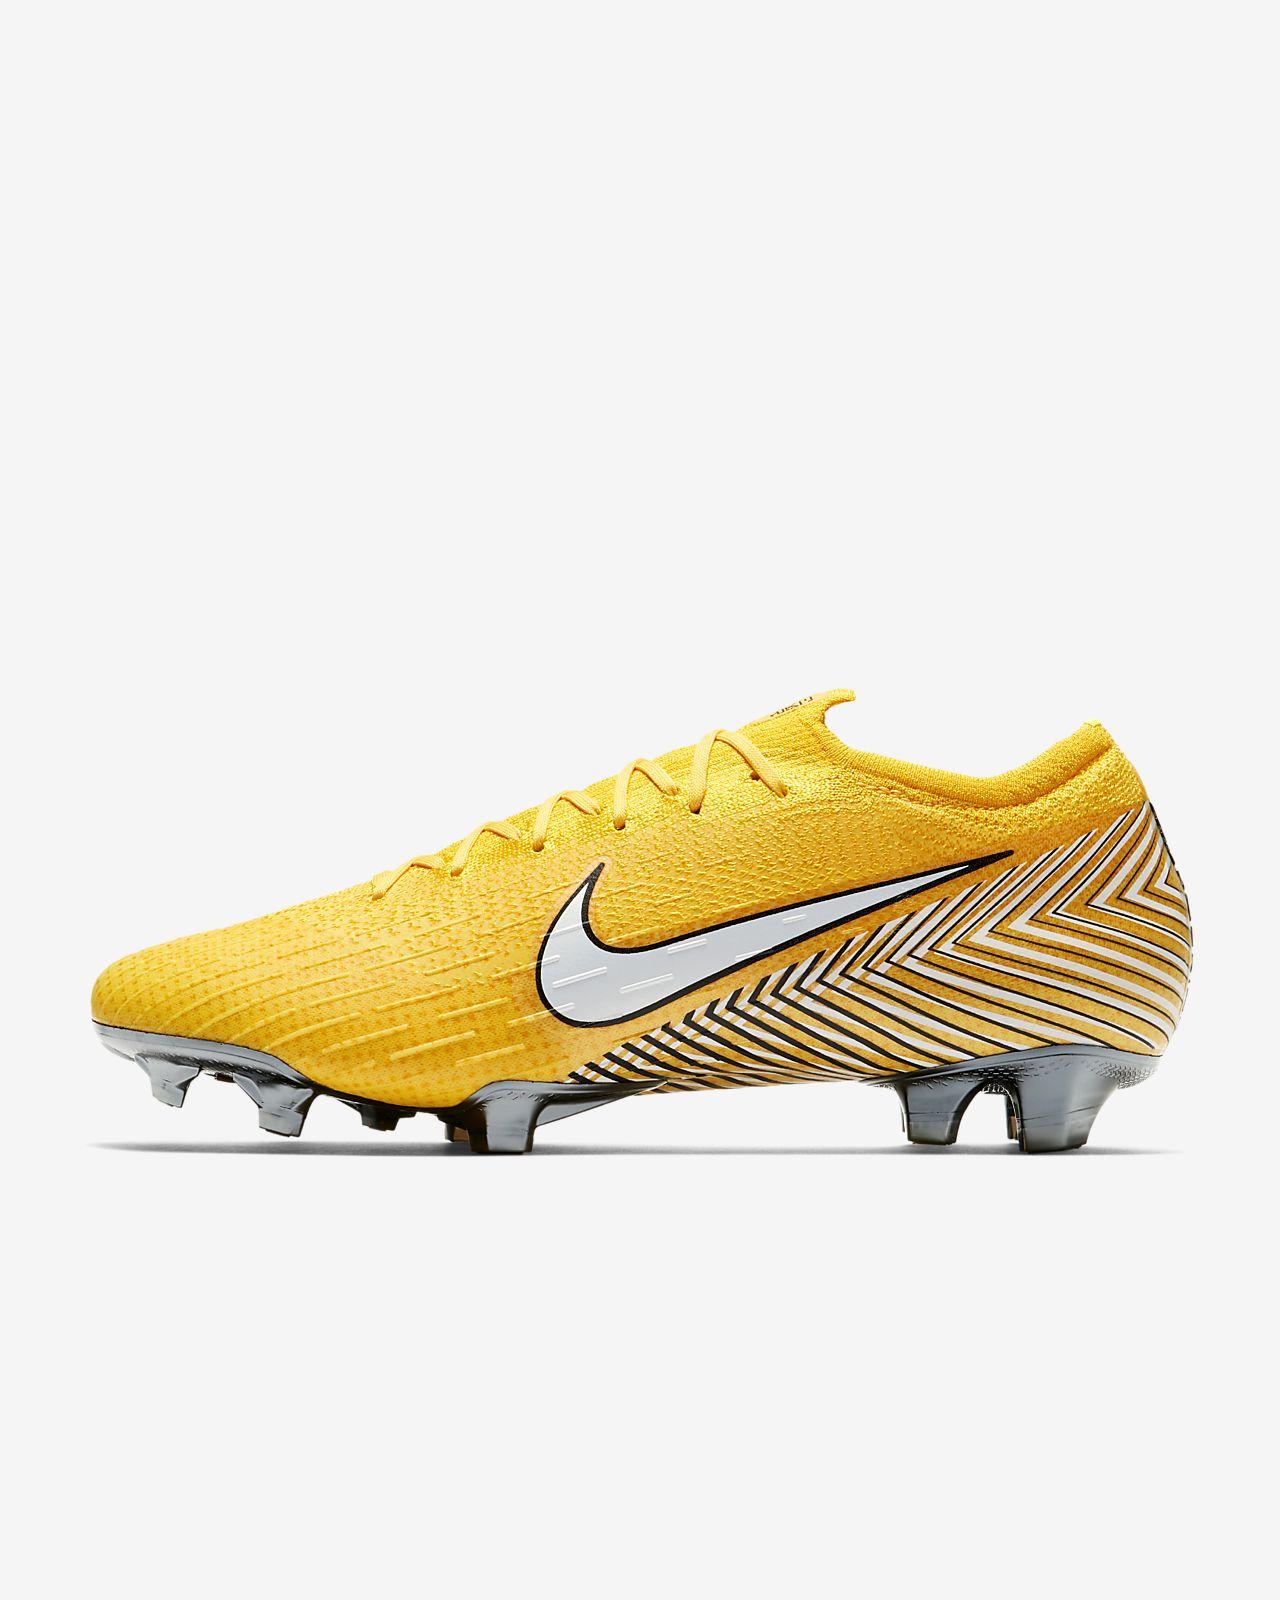 aed778d75 shopping chaussures football nike hypervenom ii phantom neymar jr fg blanc  remise 90d23 ee22e  uk calzado de fútbol para terreno firme nike mercurial  vapor ...